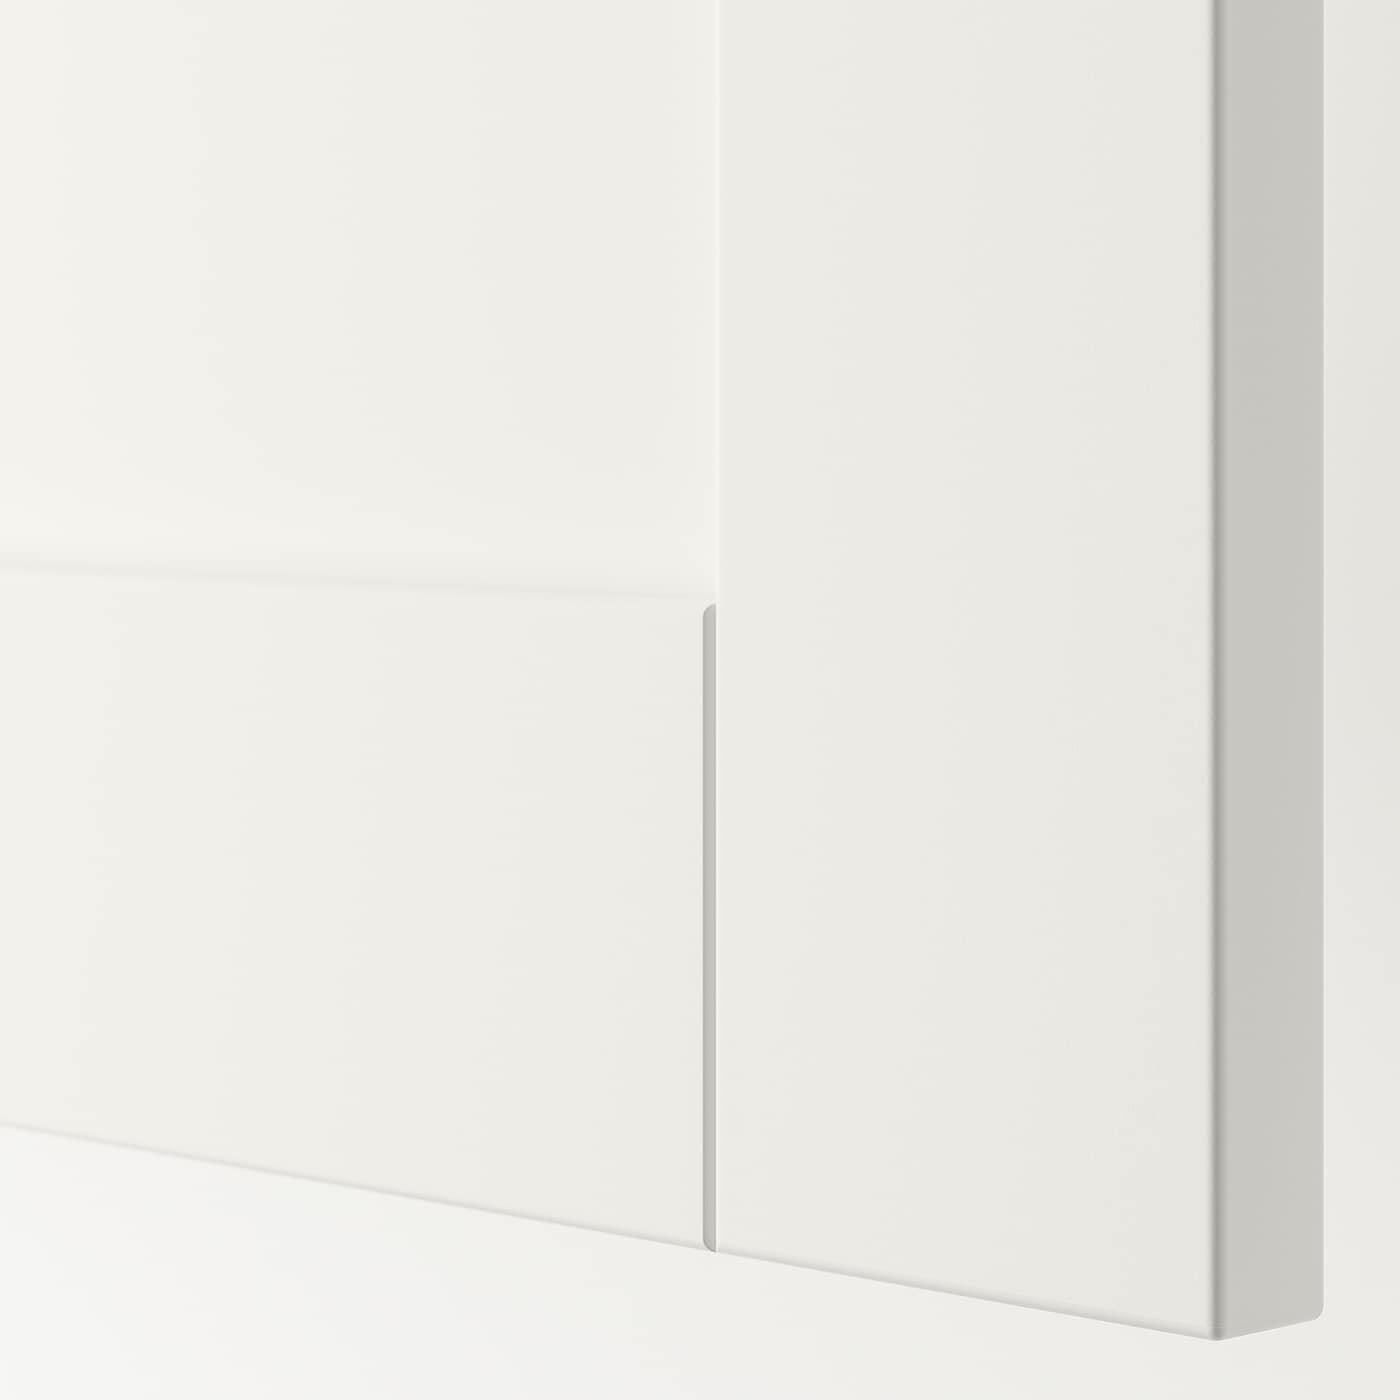 SANNIDAL Door with hinges, white, 40x60 cm